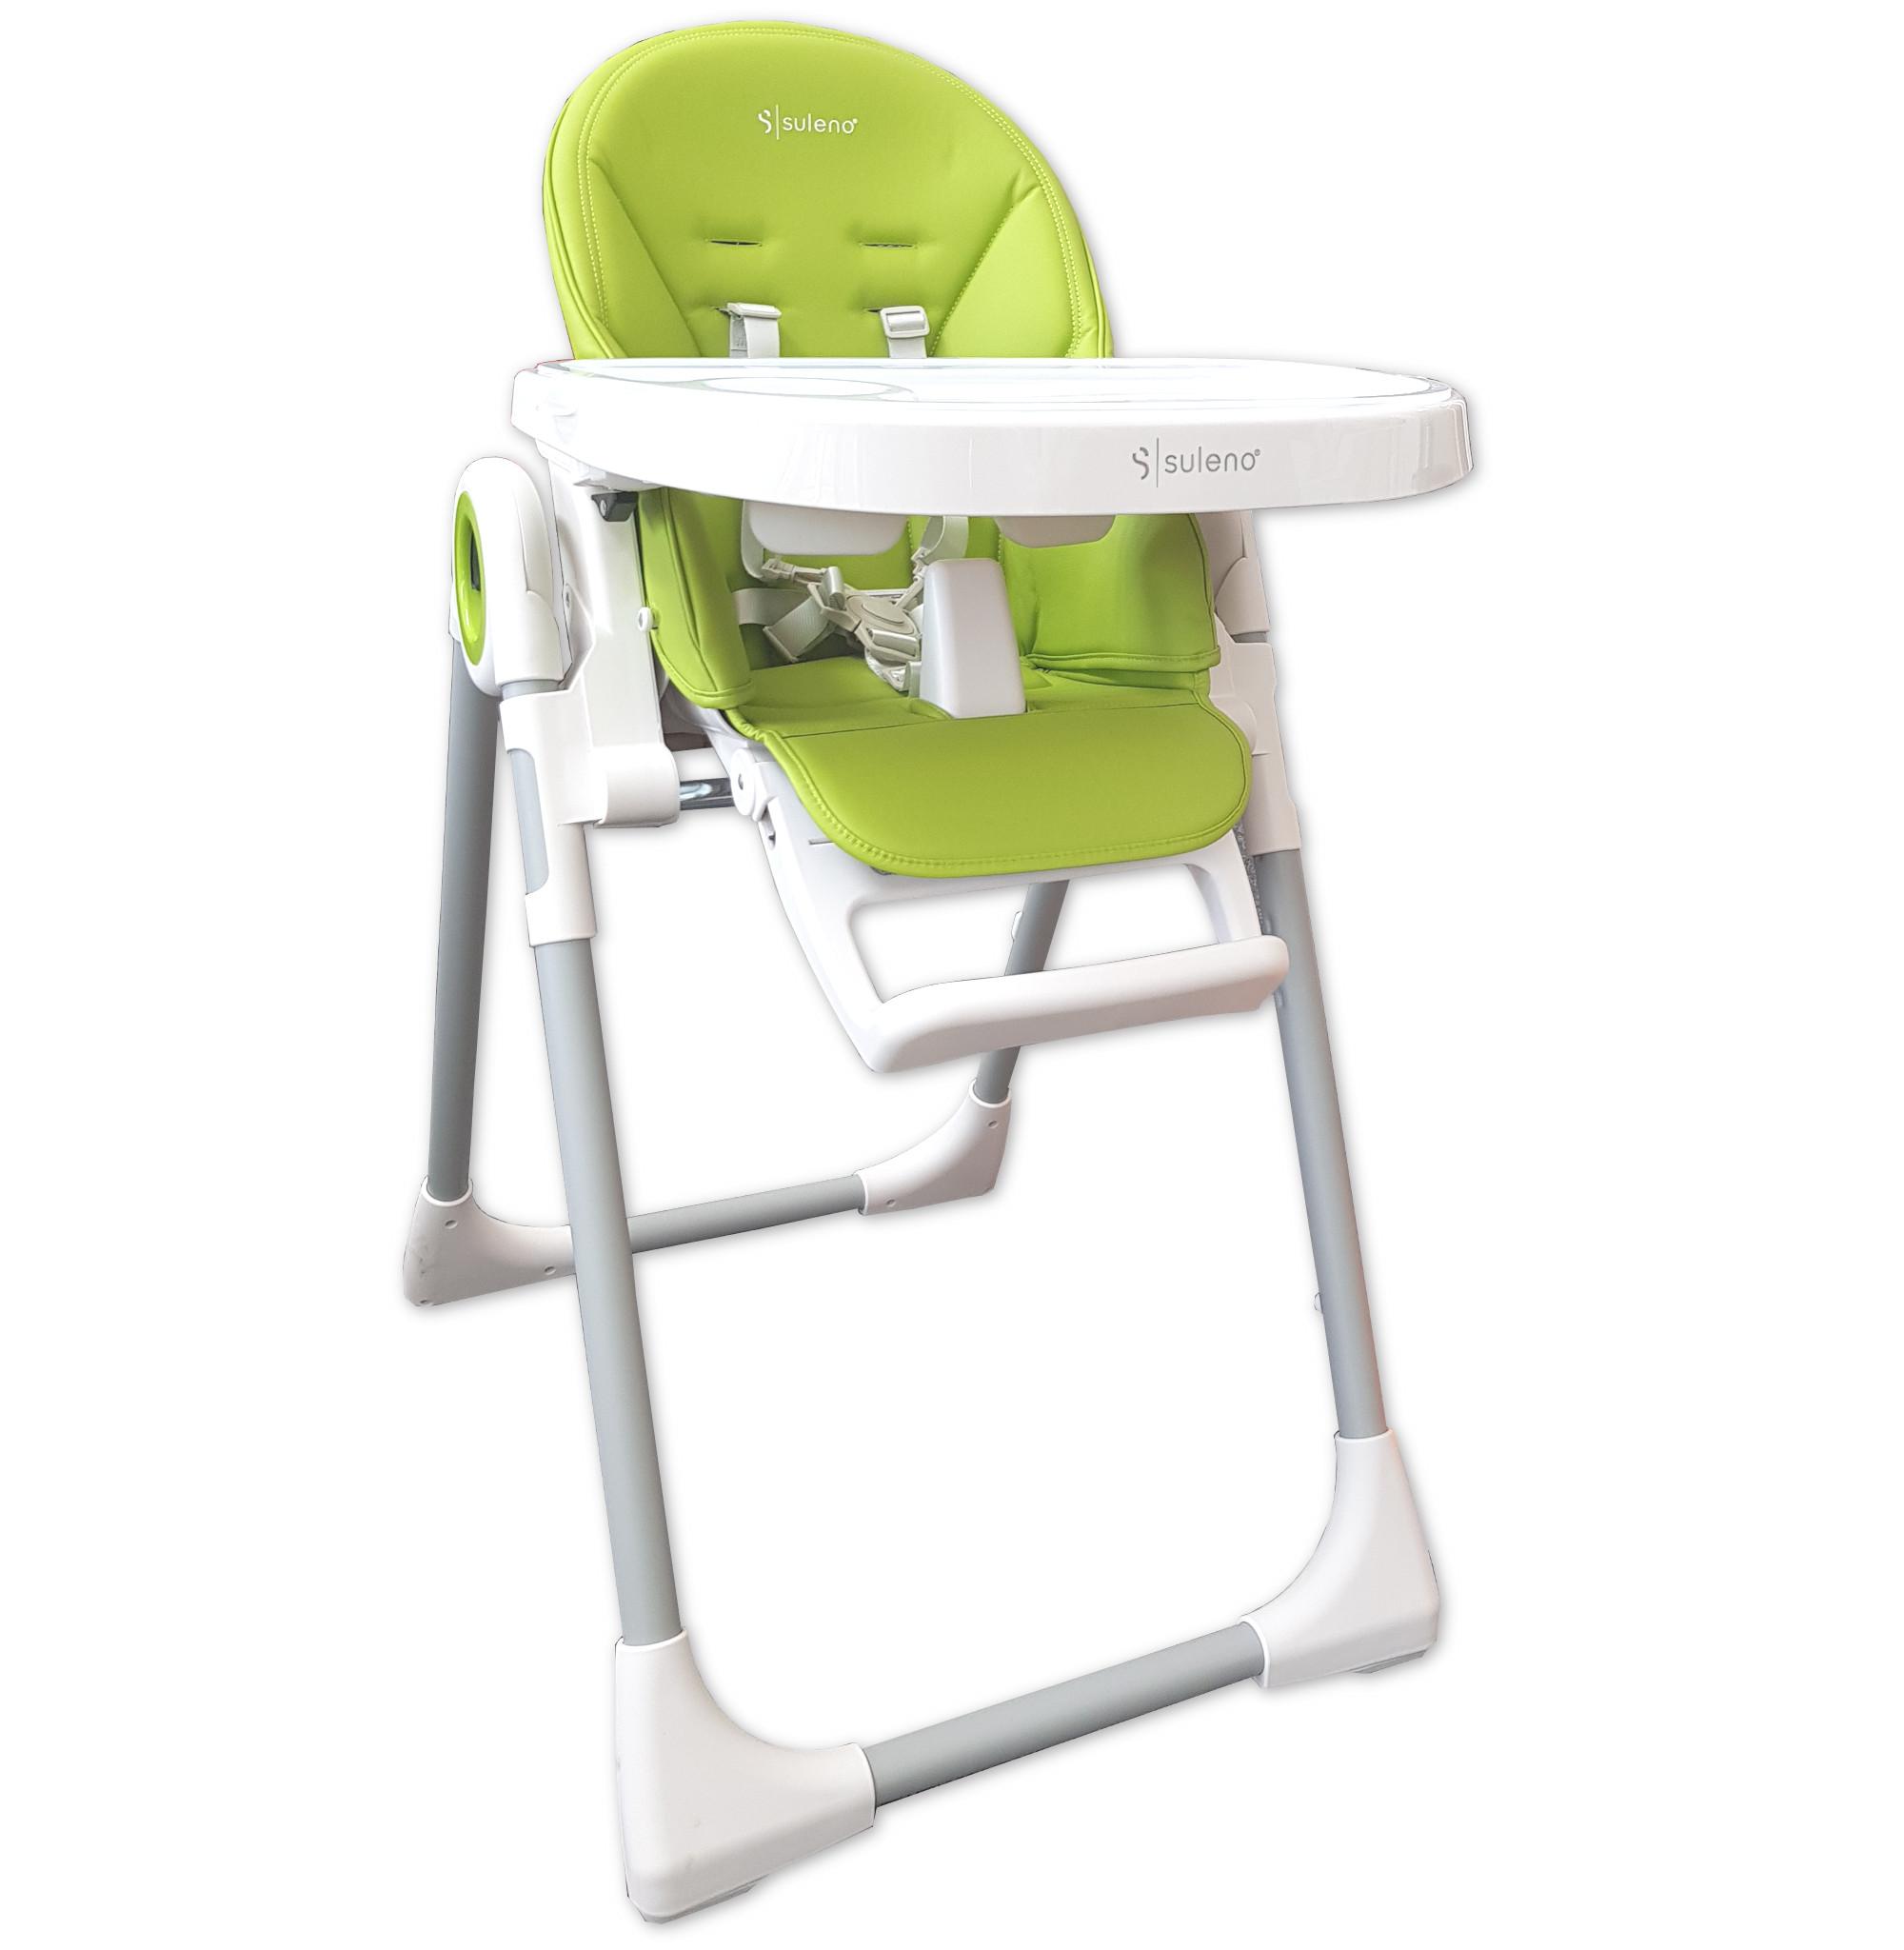 Suleno® Kinderhochstuhl LOVIS Babyhochstuhl verstellbar Kinderstuhl Hochstuhl